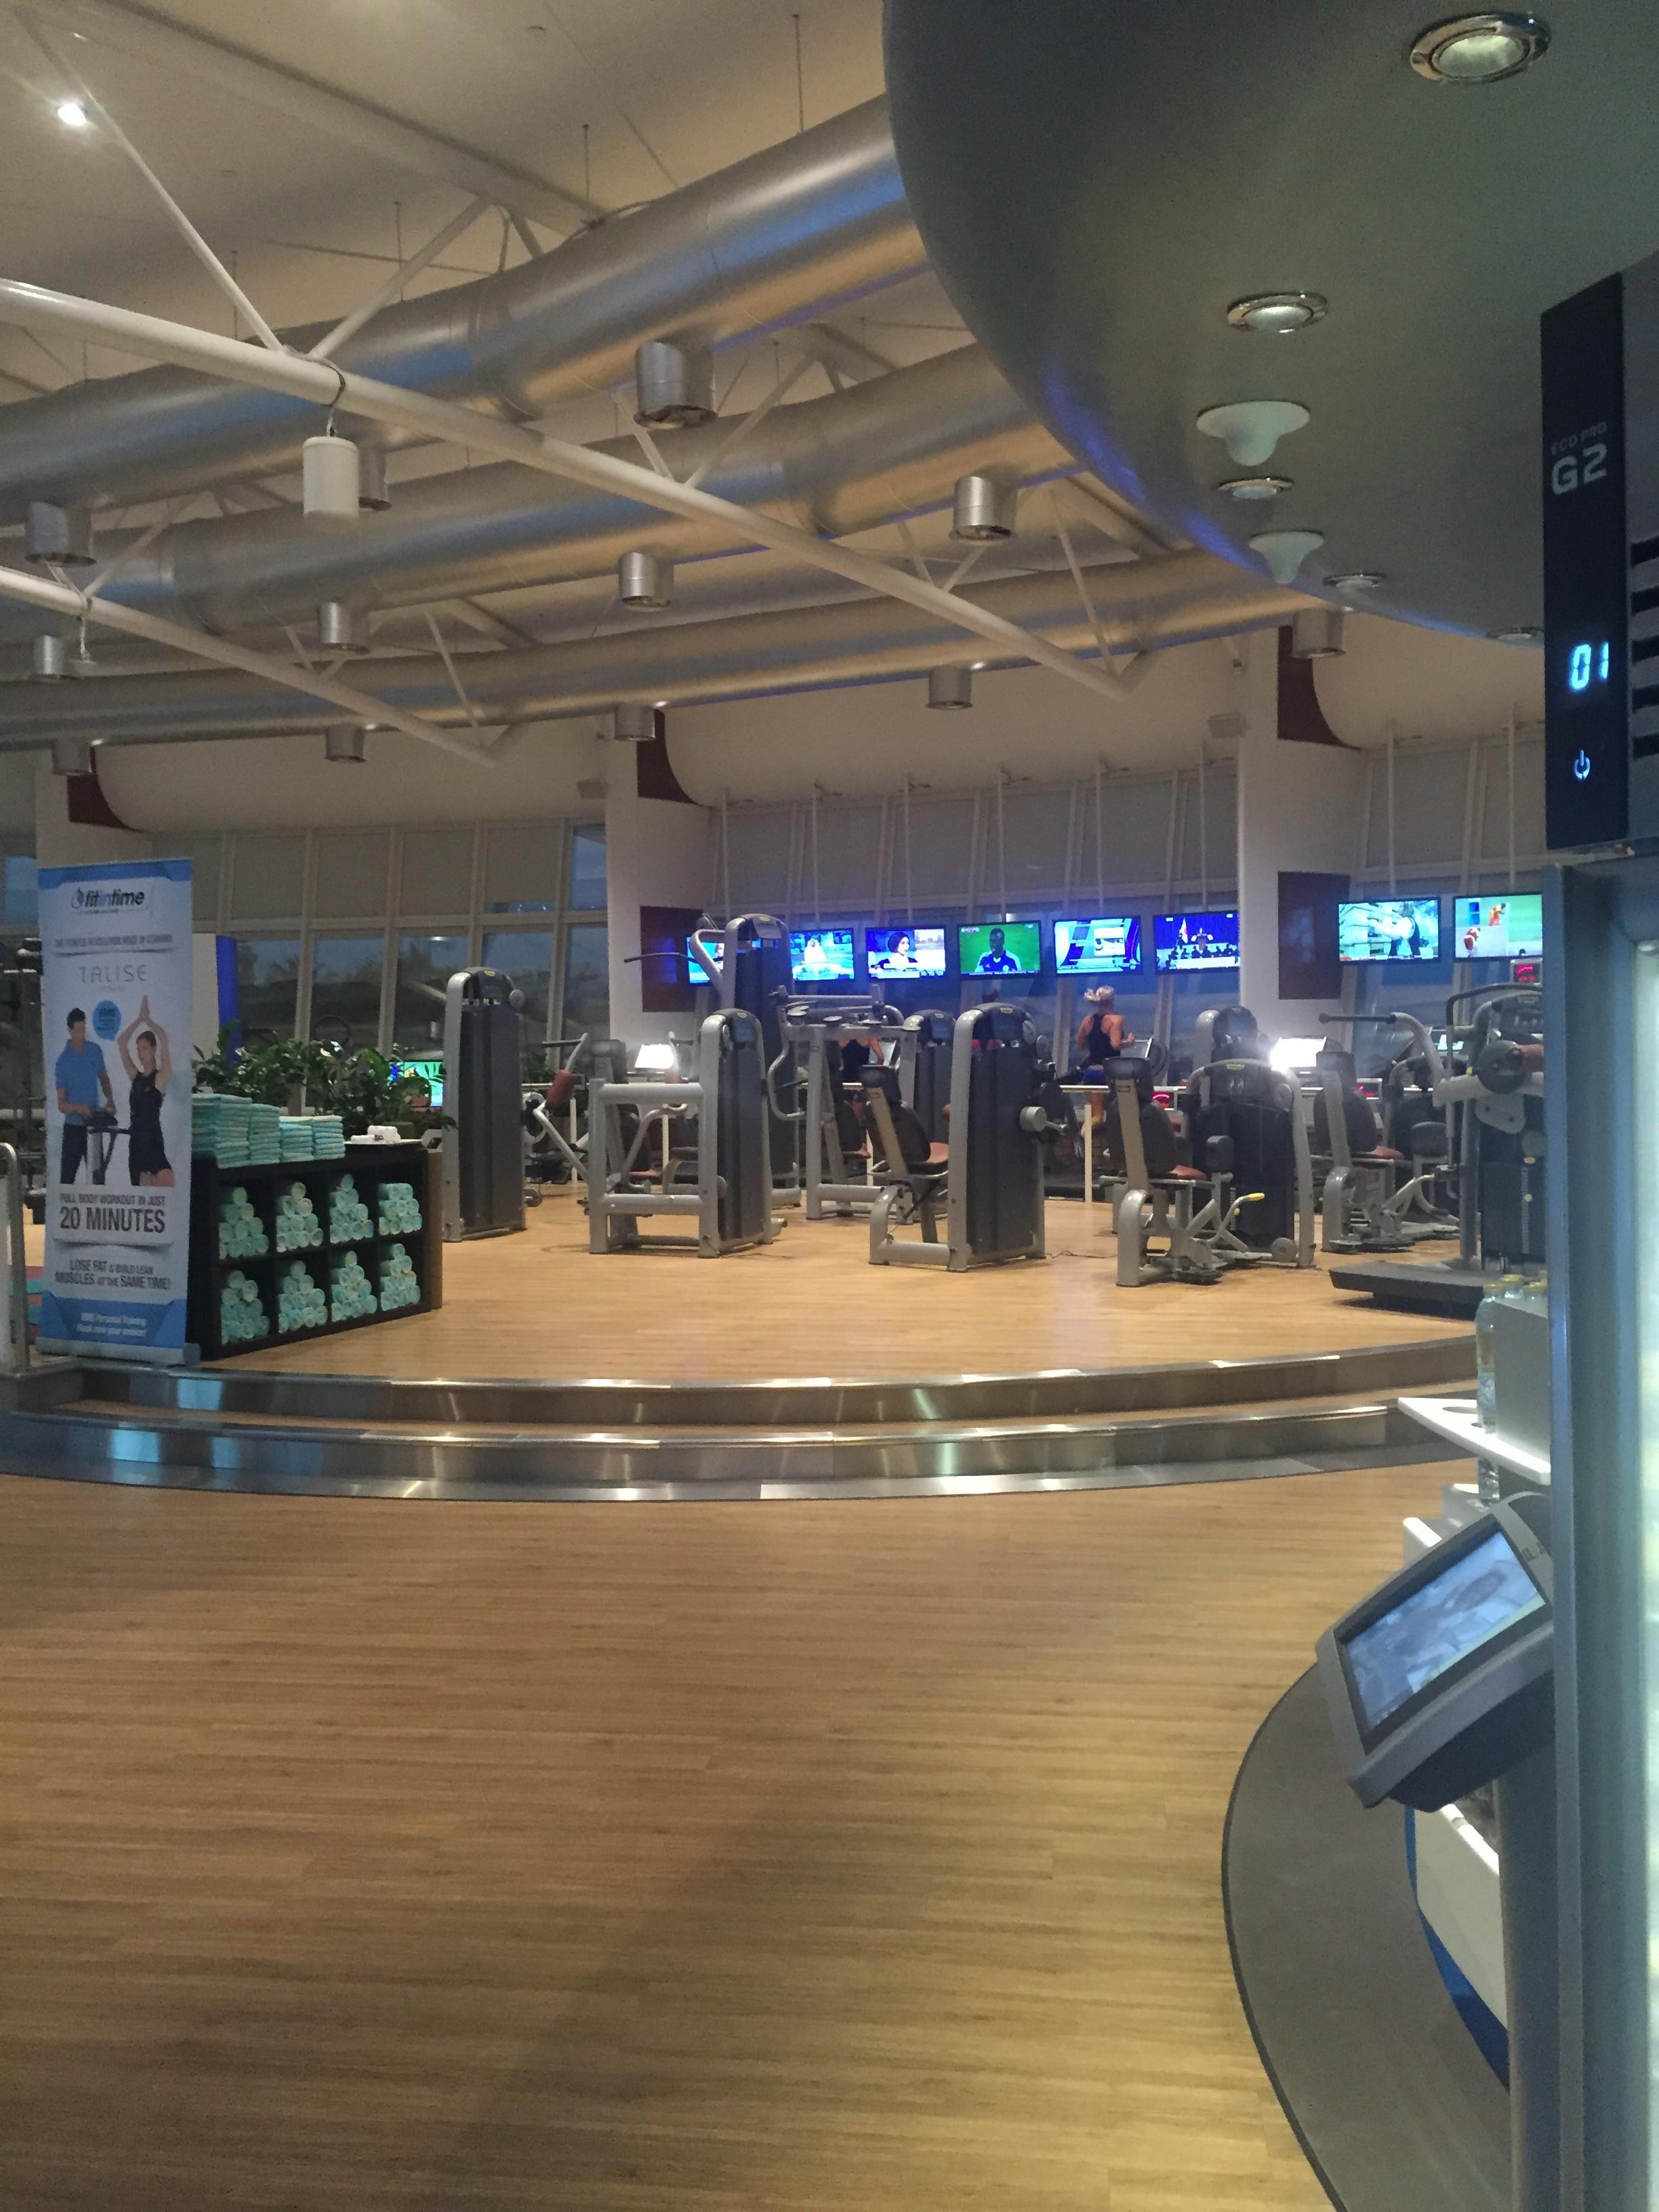 Meredith Kessler Dubai Jumeirah Beach Hotel Gym